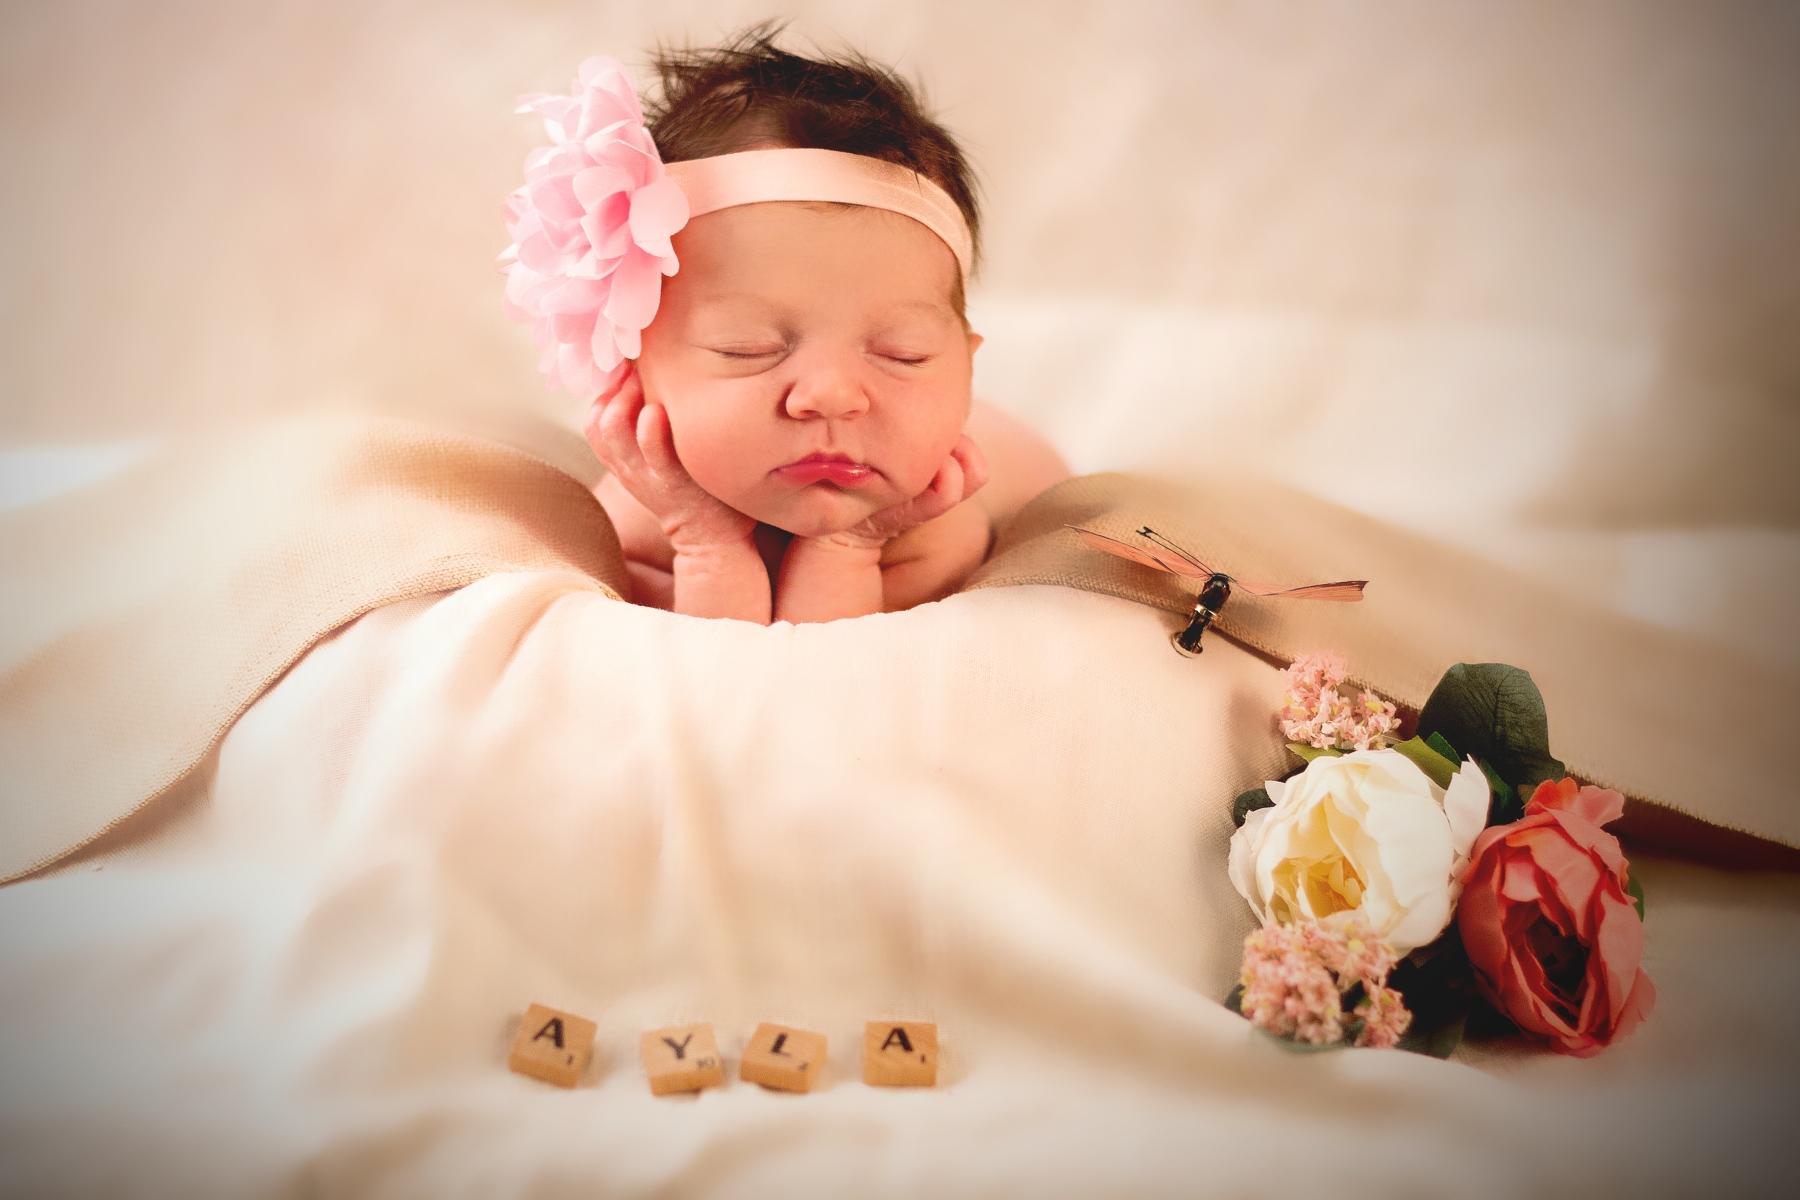 Newborn Shooting Ayla - Fotografduisburg Hendrich - Design & Fotografie